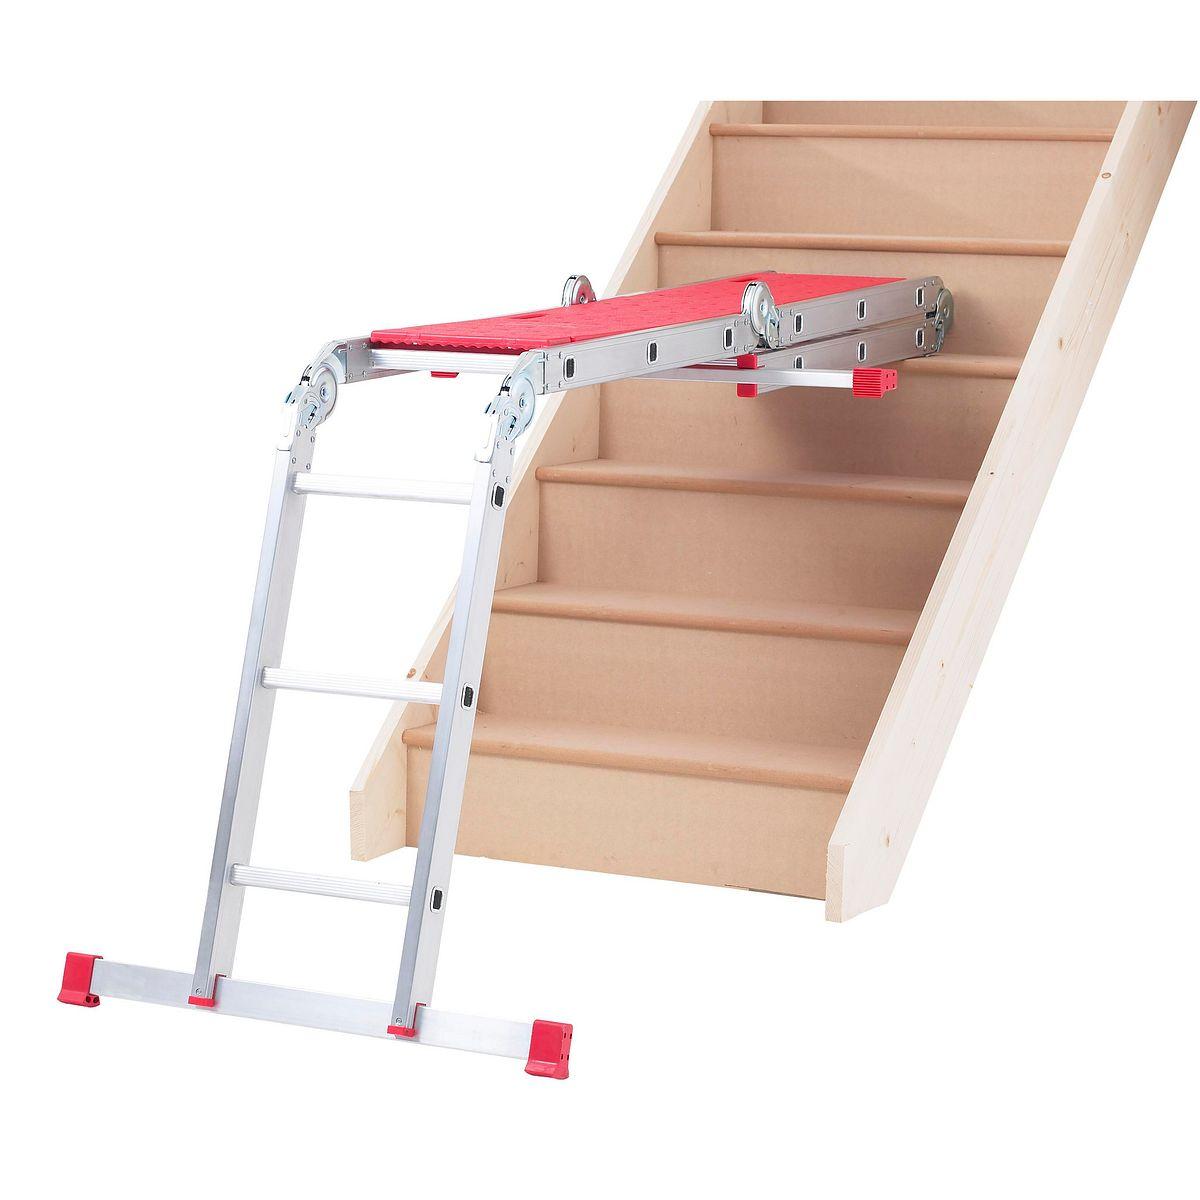 75012 Combination Ladders Werner Eu